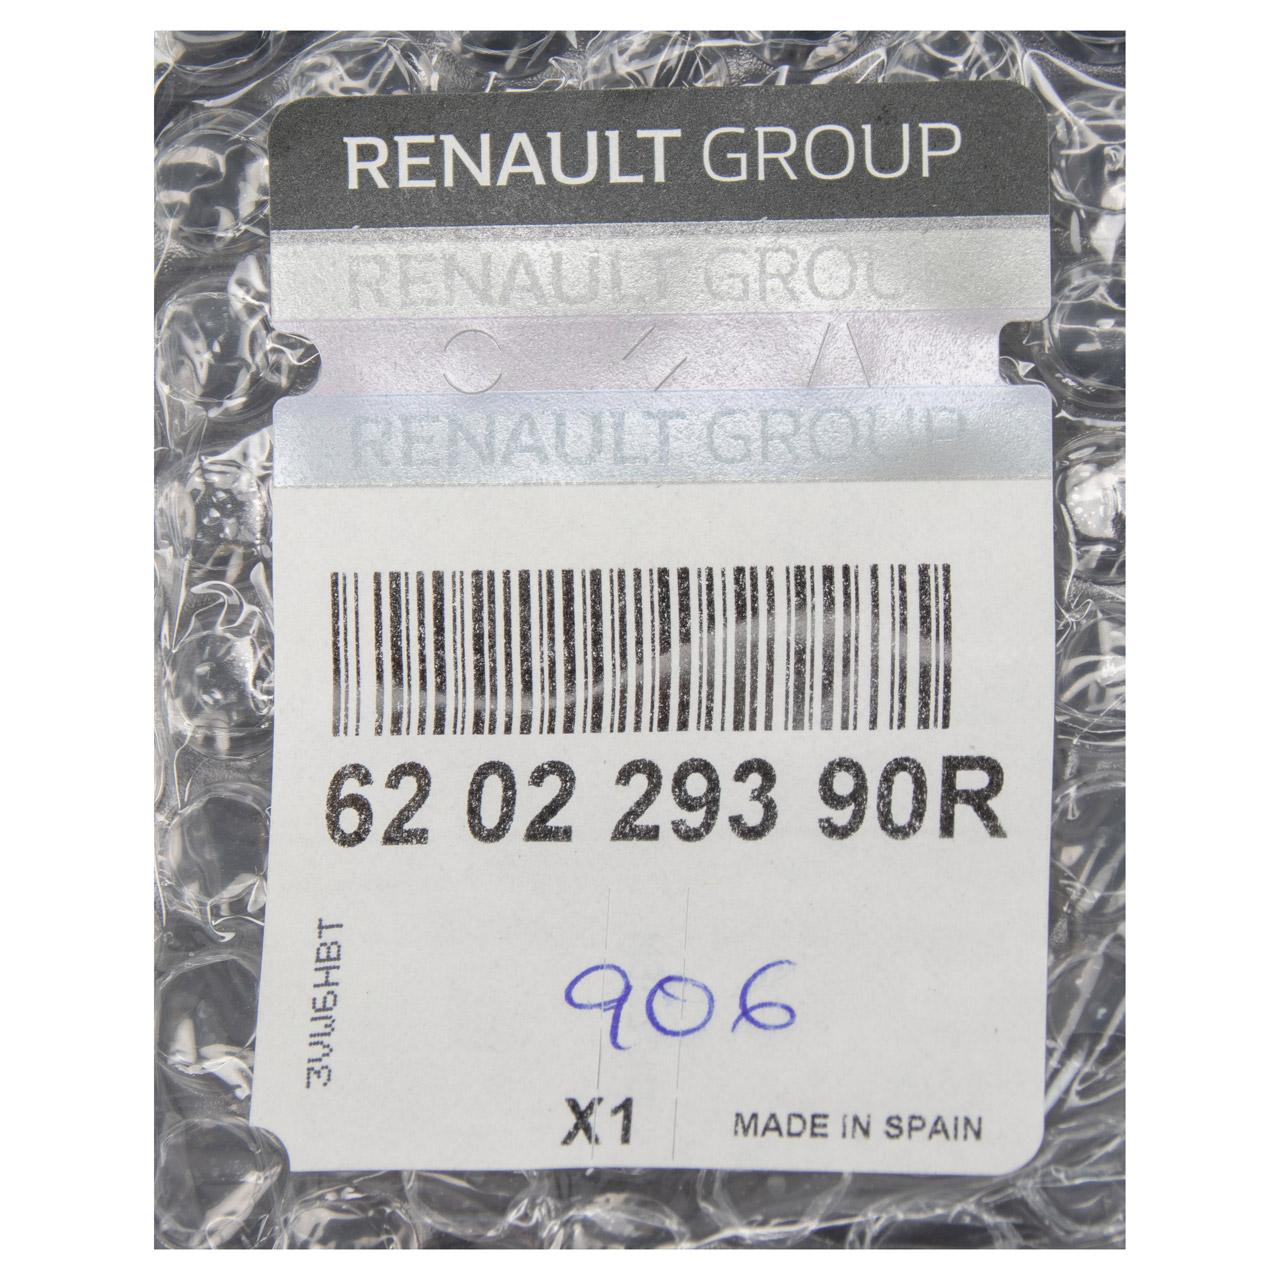 ORIGINAL Renault Stoßstange Frontverkleidung CAPTUR (J5_, H5_) 620229390R